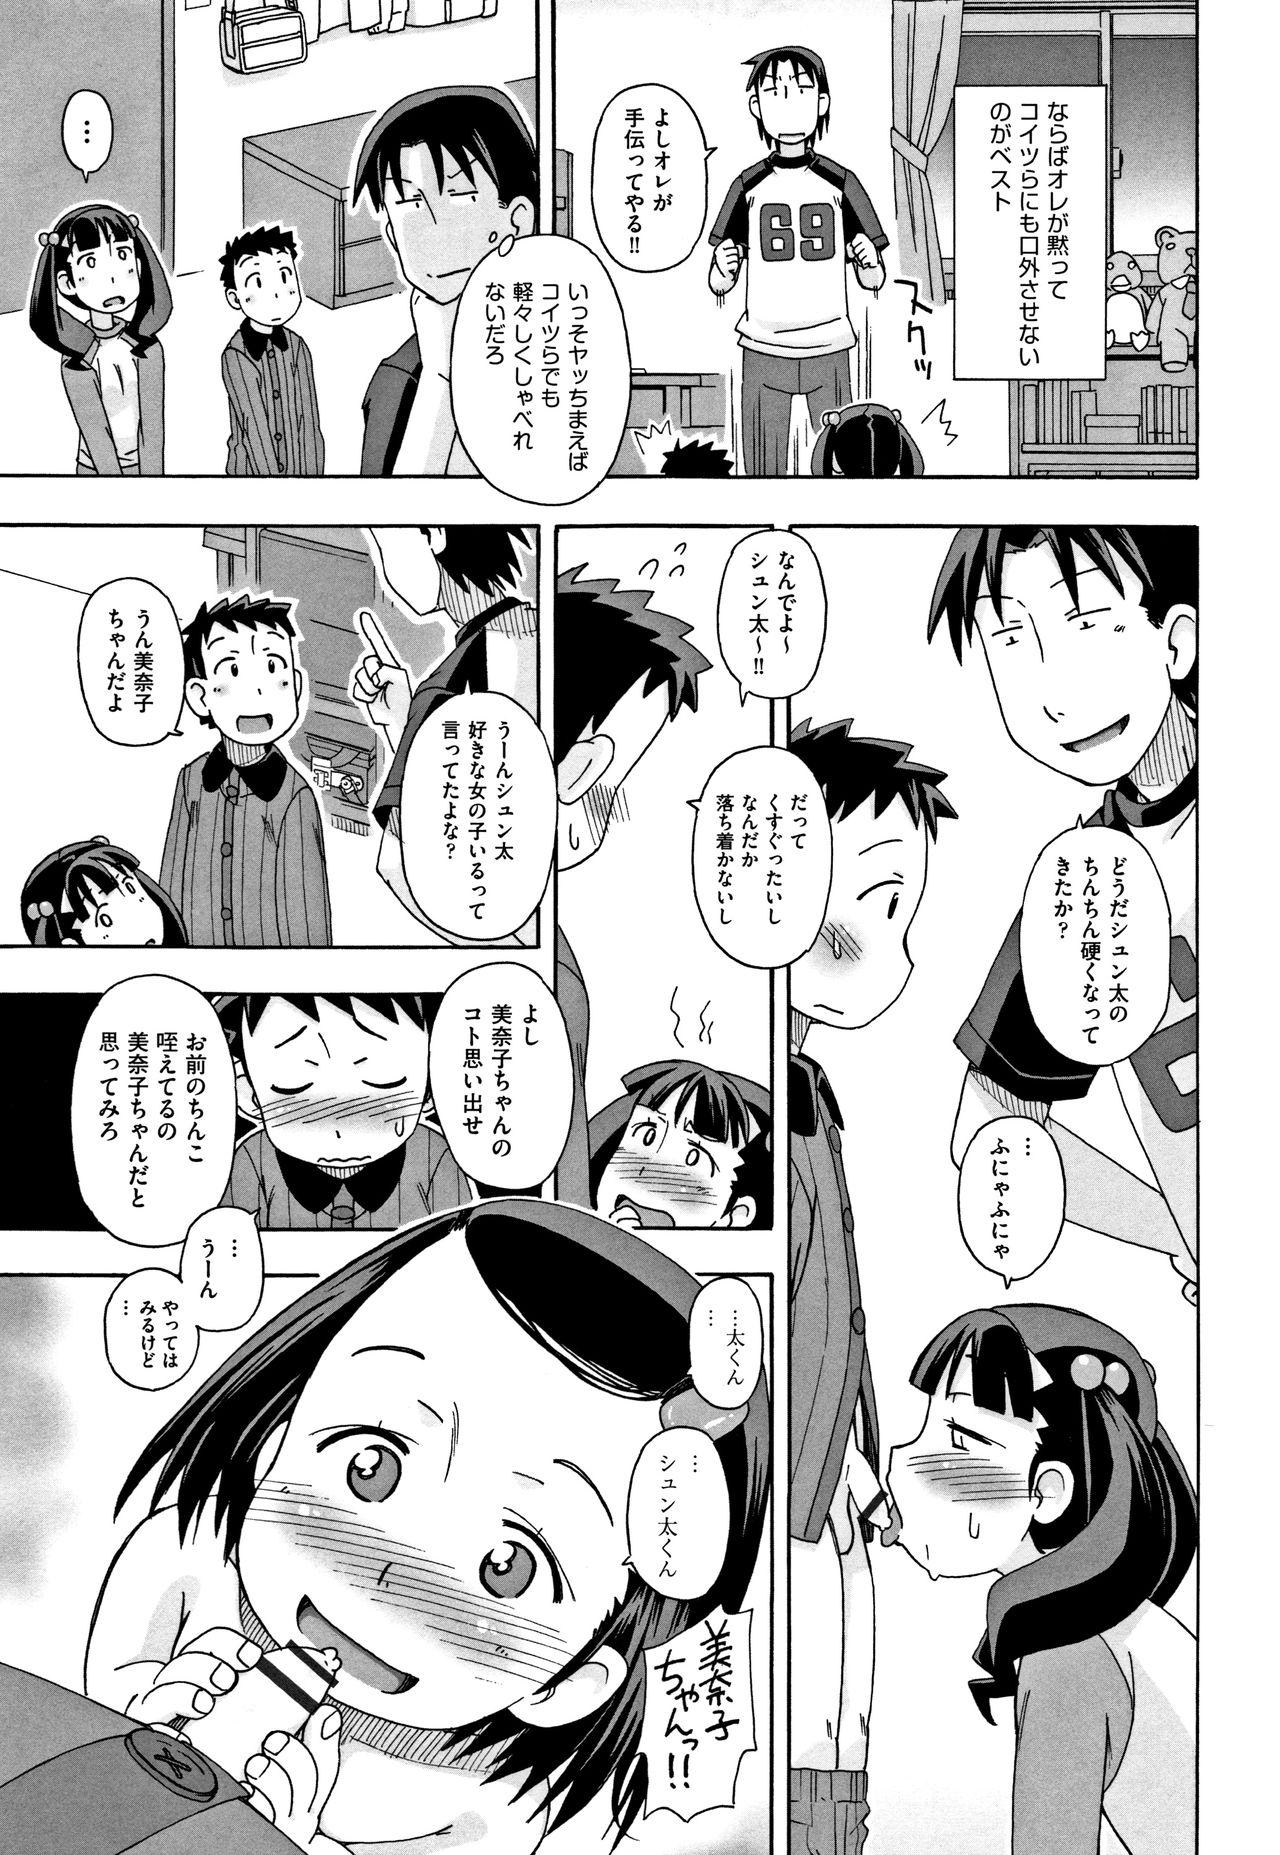 Shoujo Kumikyoku 5 194